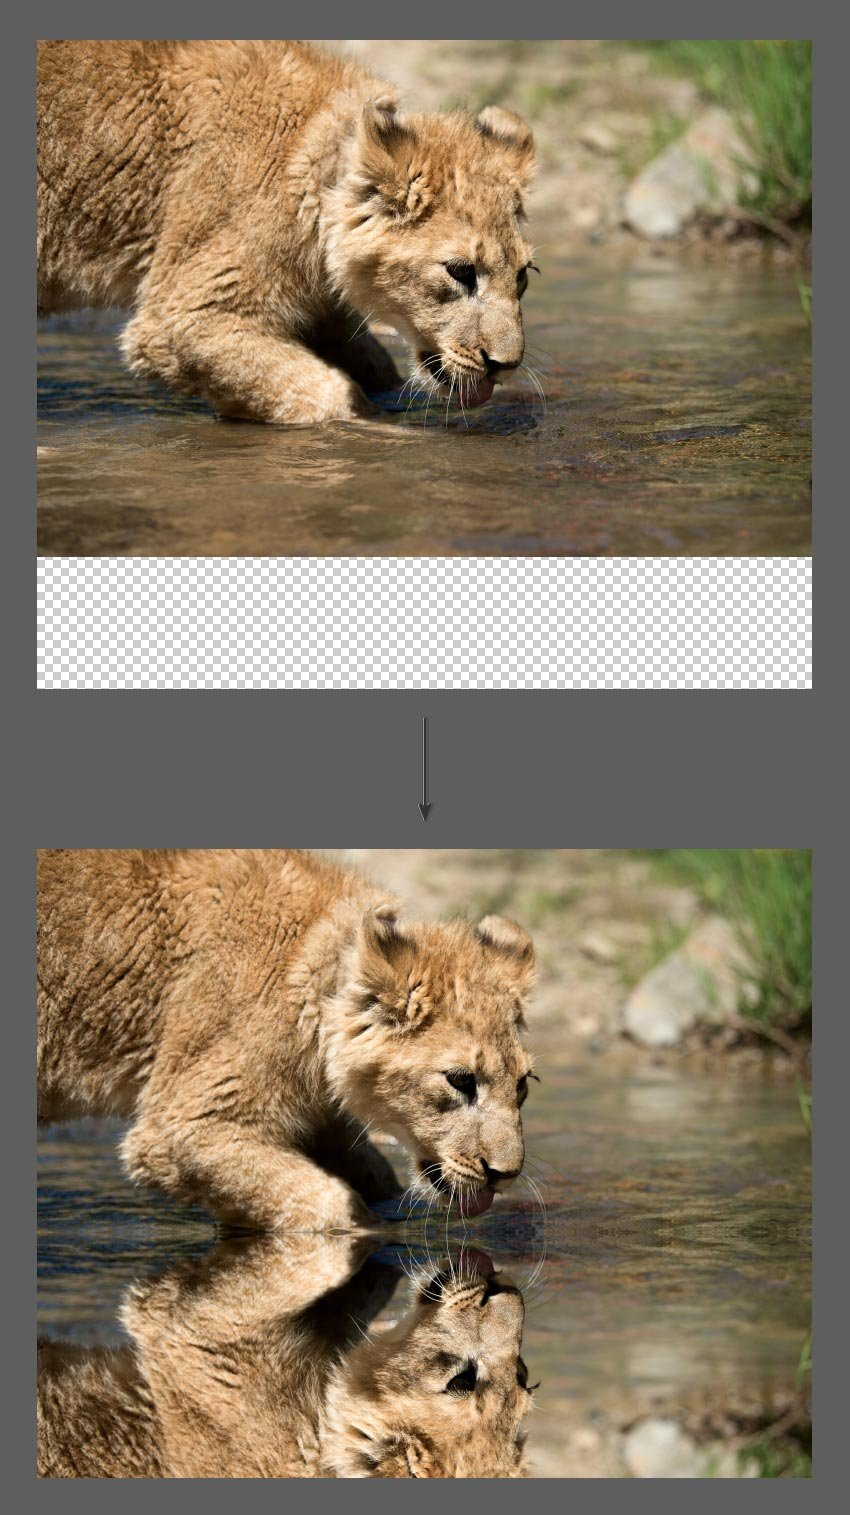 Move flipped Photoshop layer